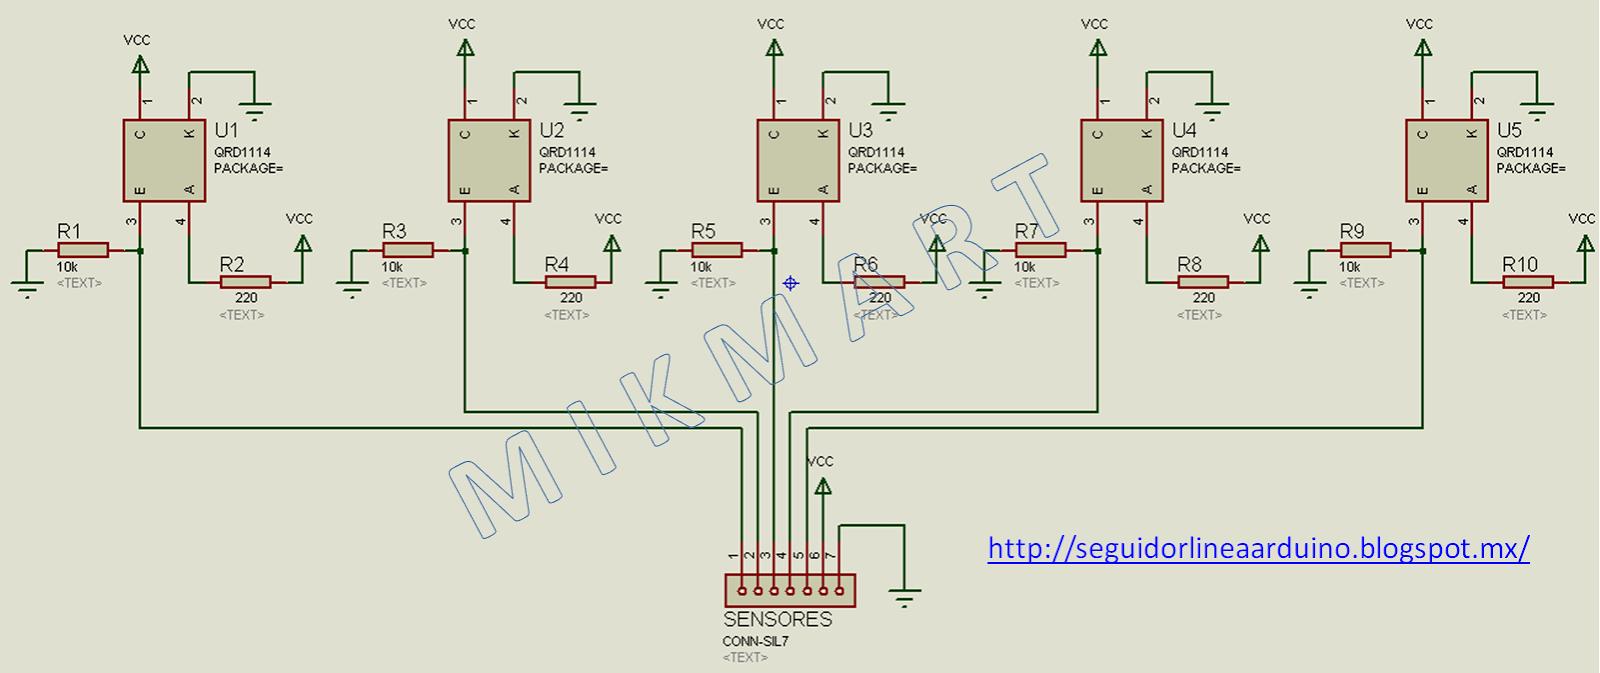 Sensor QRD 1114 Como conectar al Arduino? DUDAS